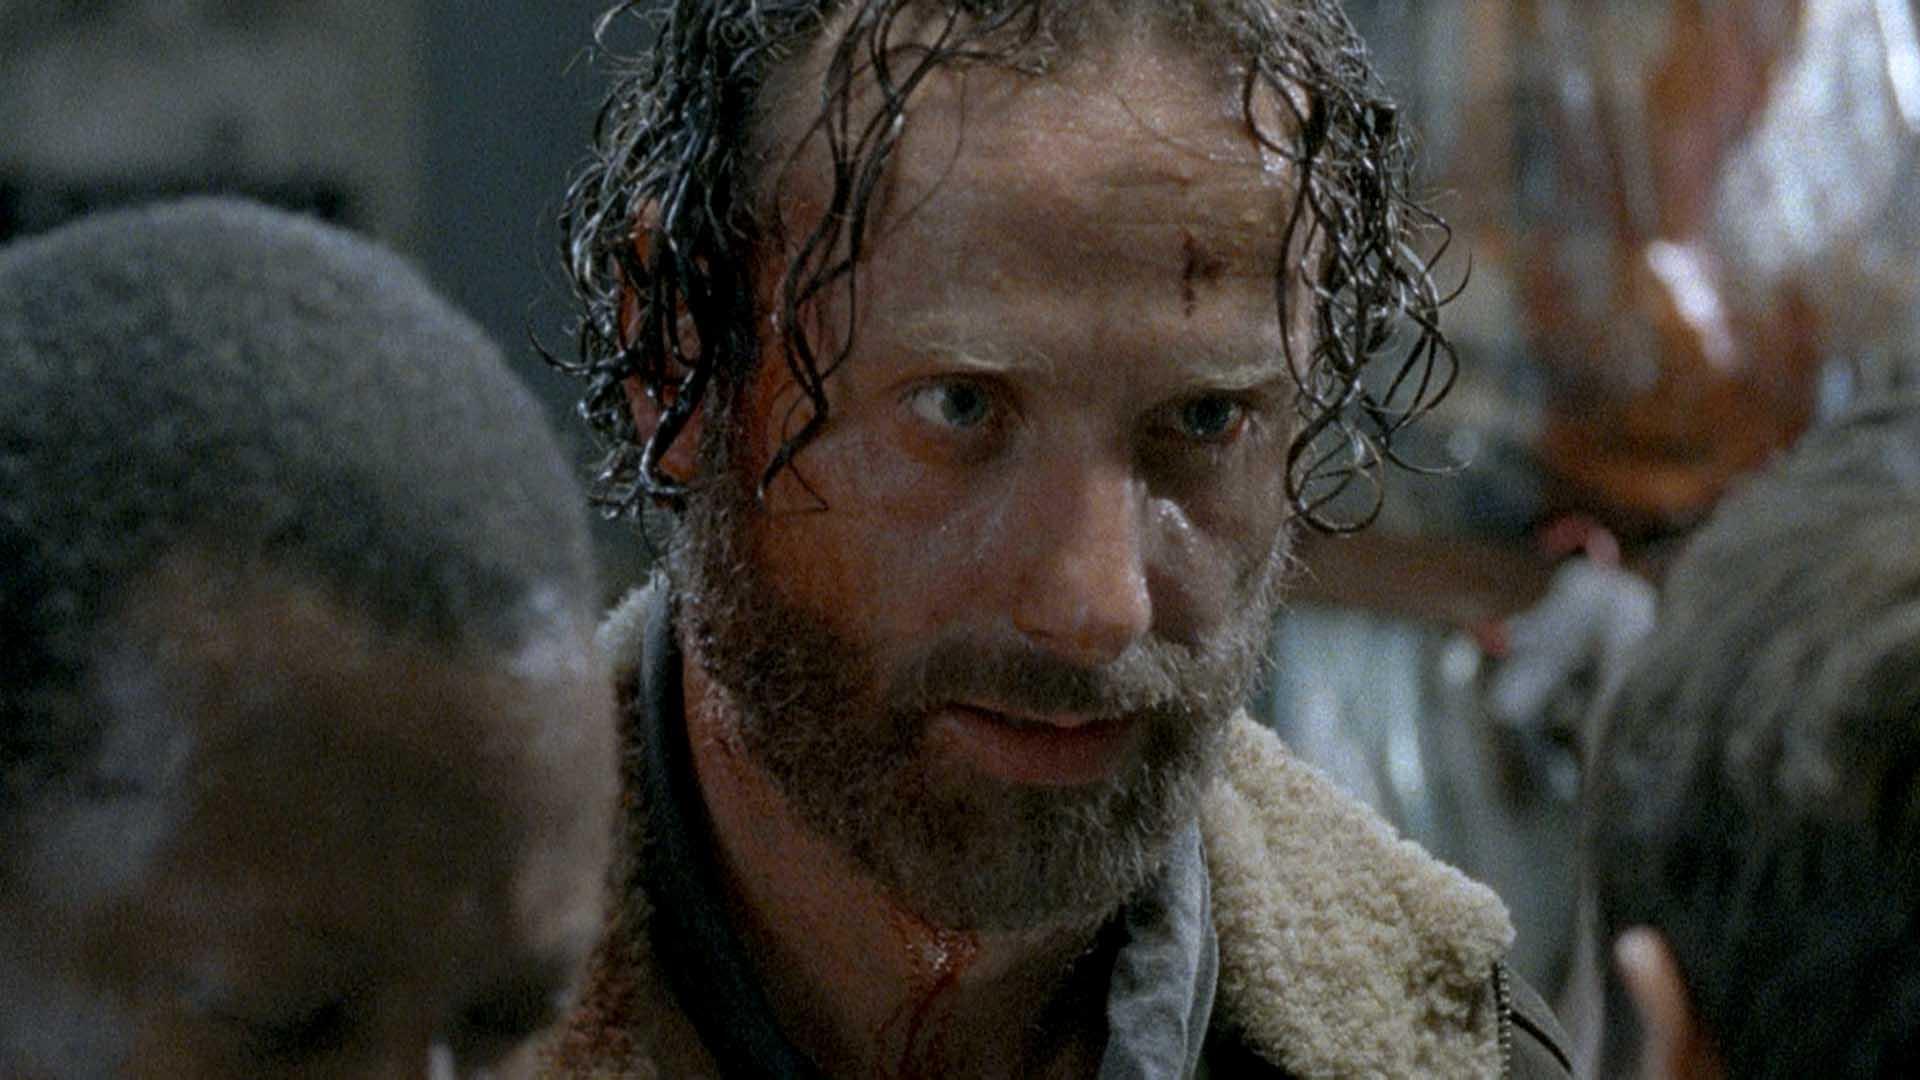 Blogs The Walking Dead Days Before The Season 5 Premiere Amc